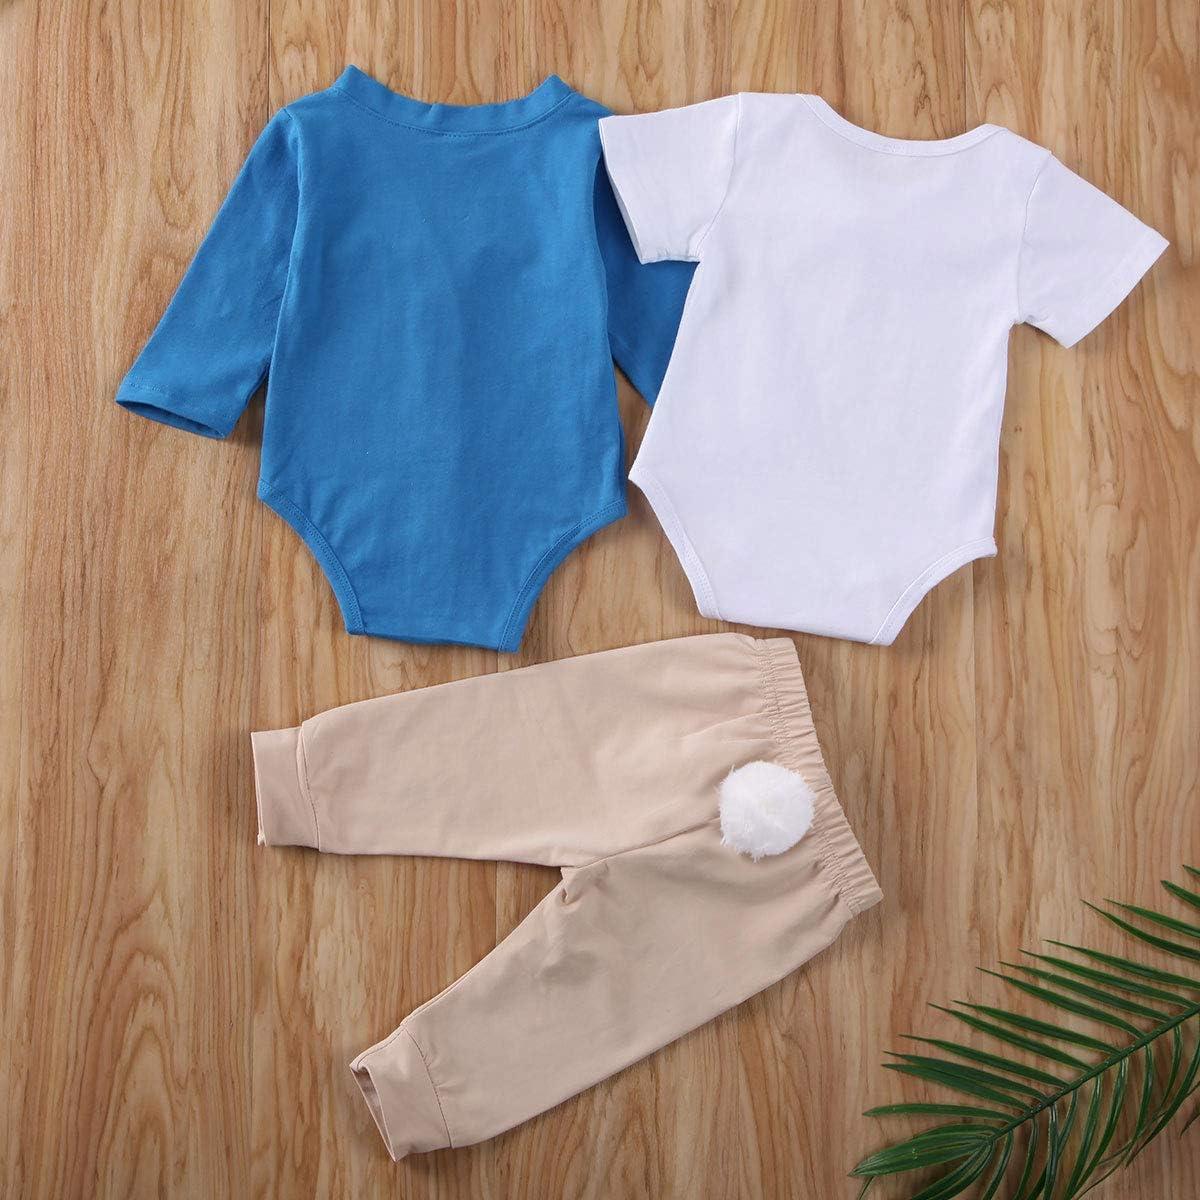 Geagodelia New Born Infant Baby boy Easter Clothes 3Pcs Outfits Long Sleeve Rabbit Romper Short Sleeve Bodysuit Trouser